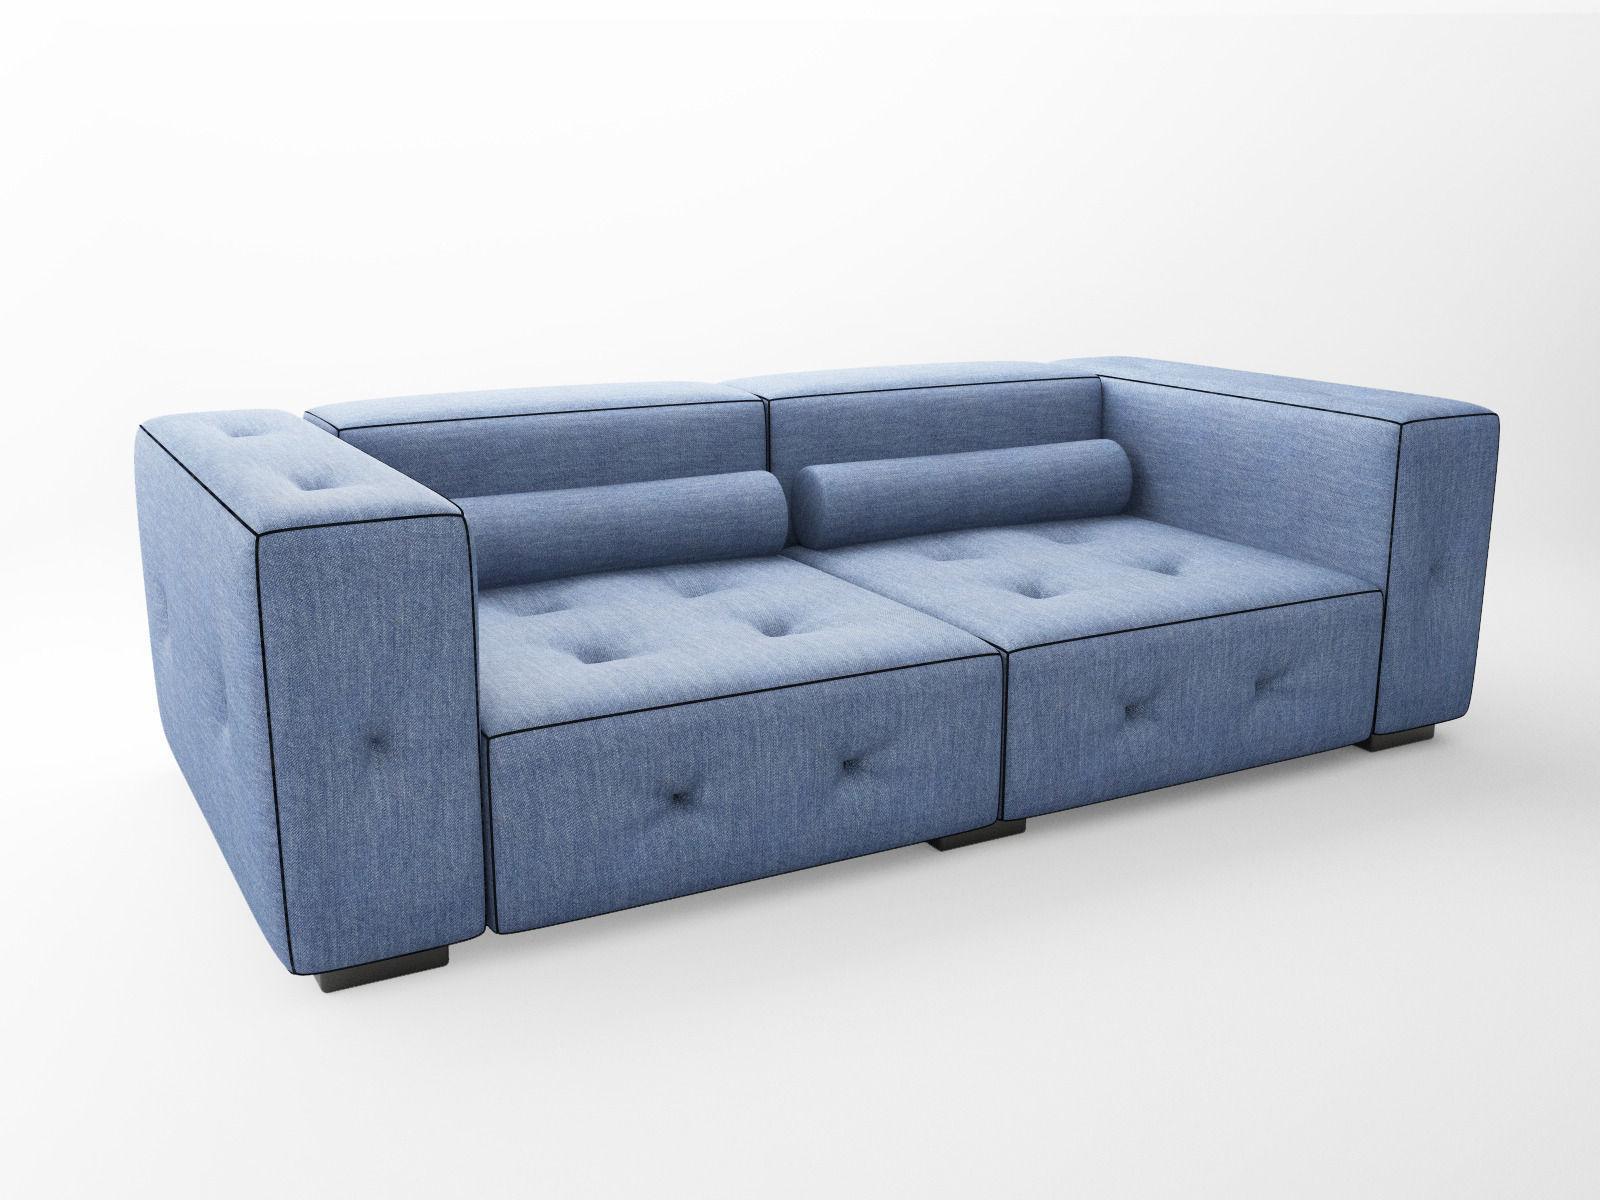 Denim couch 3D model